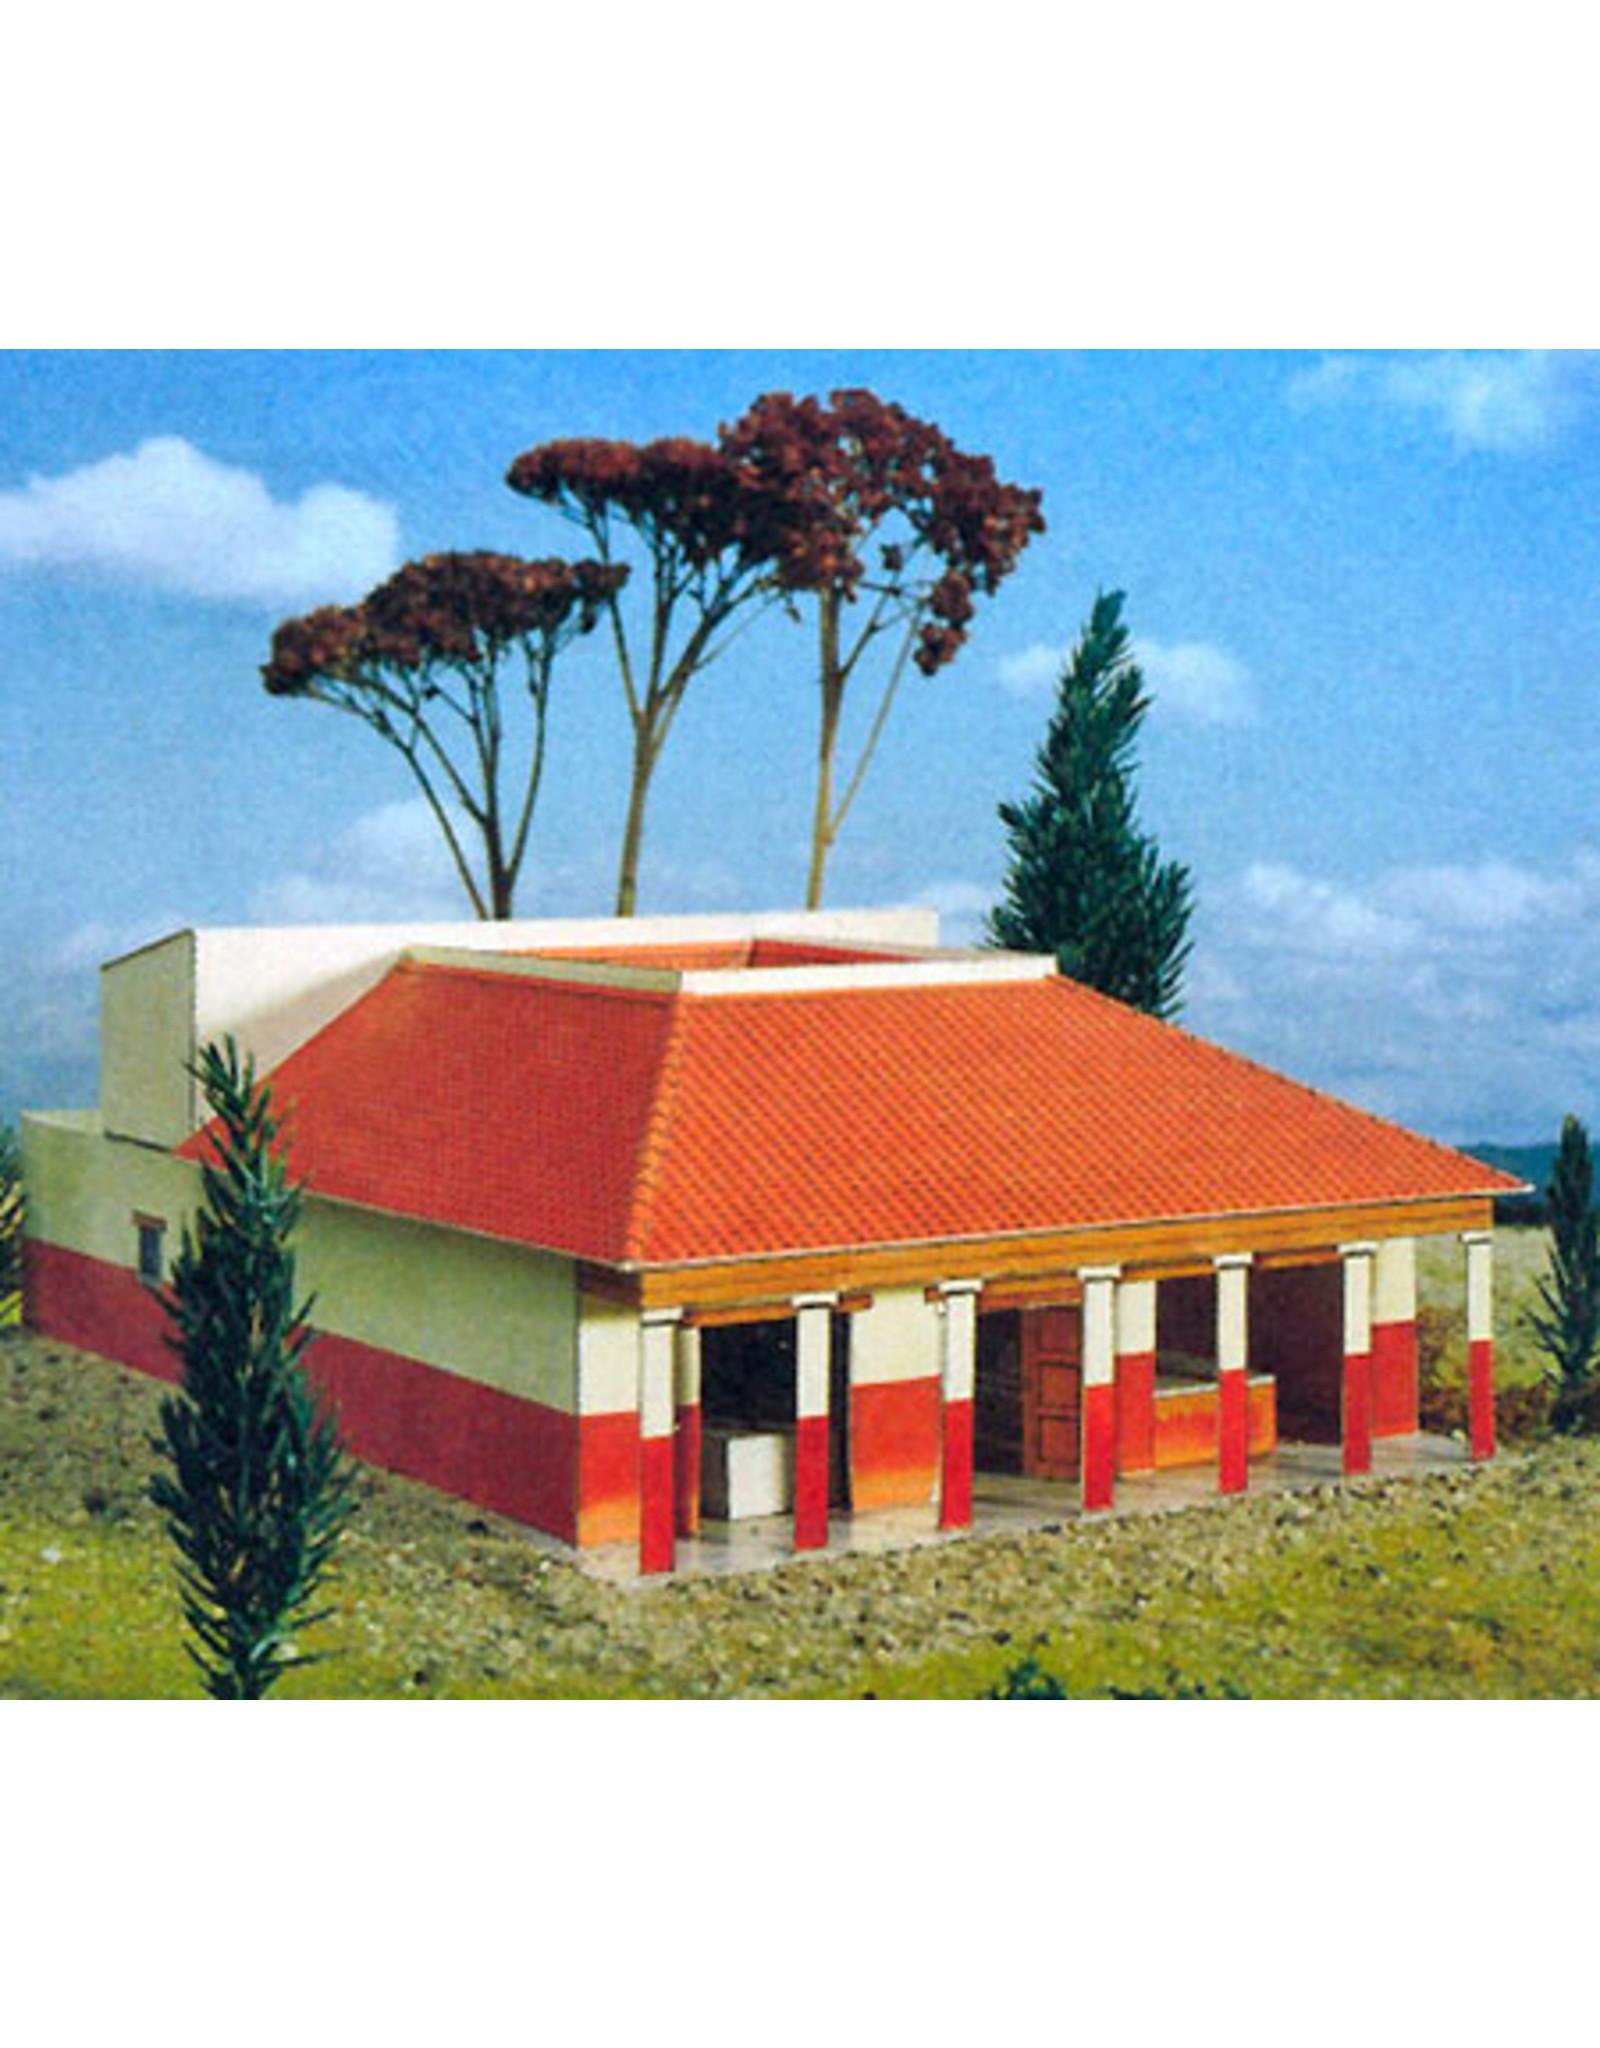 Schreiber-Bogen Romeinse villa (bouwplaat 1:87)